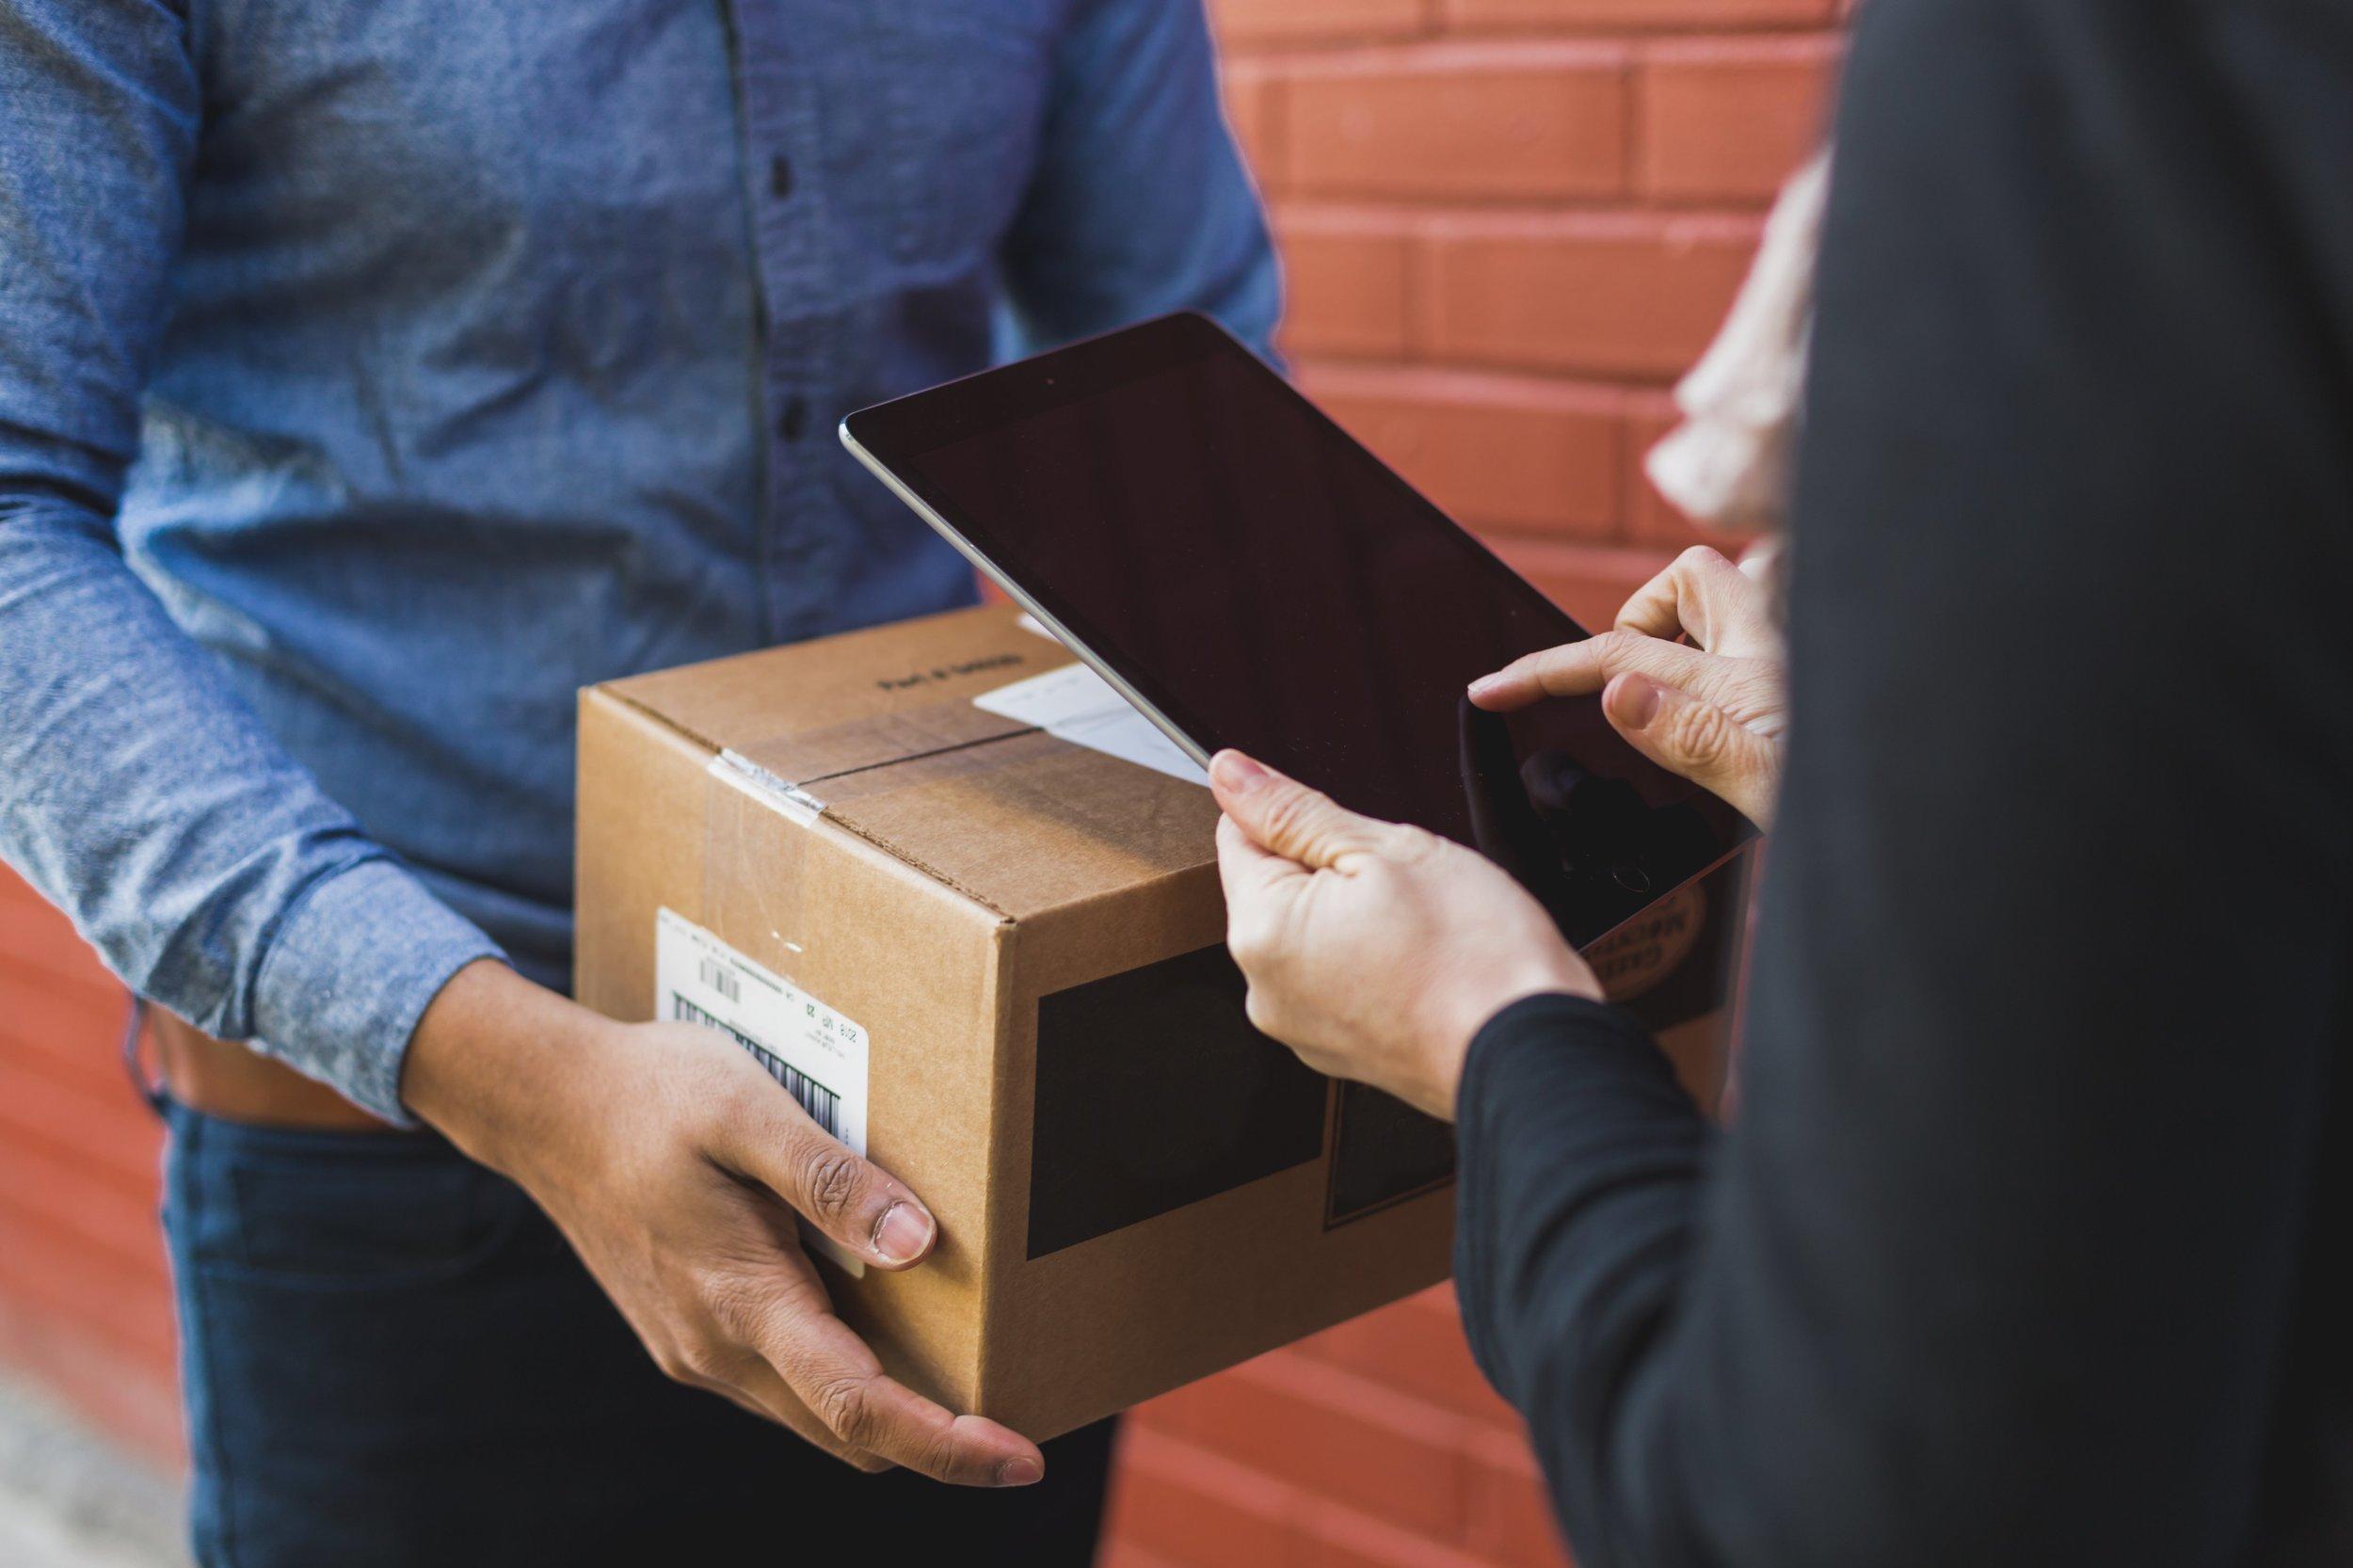 receiving-shipping-box-on-ipad.jpg